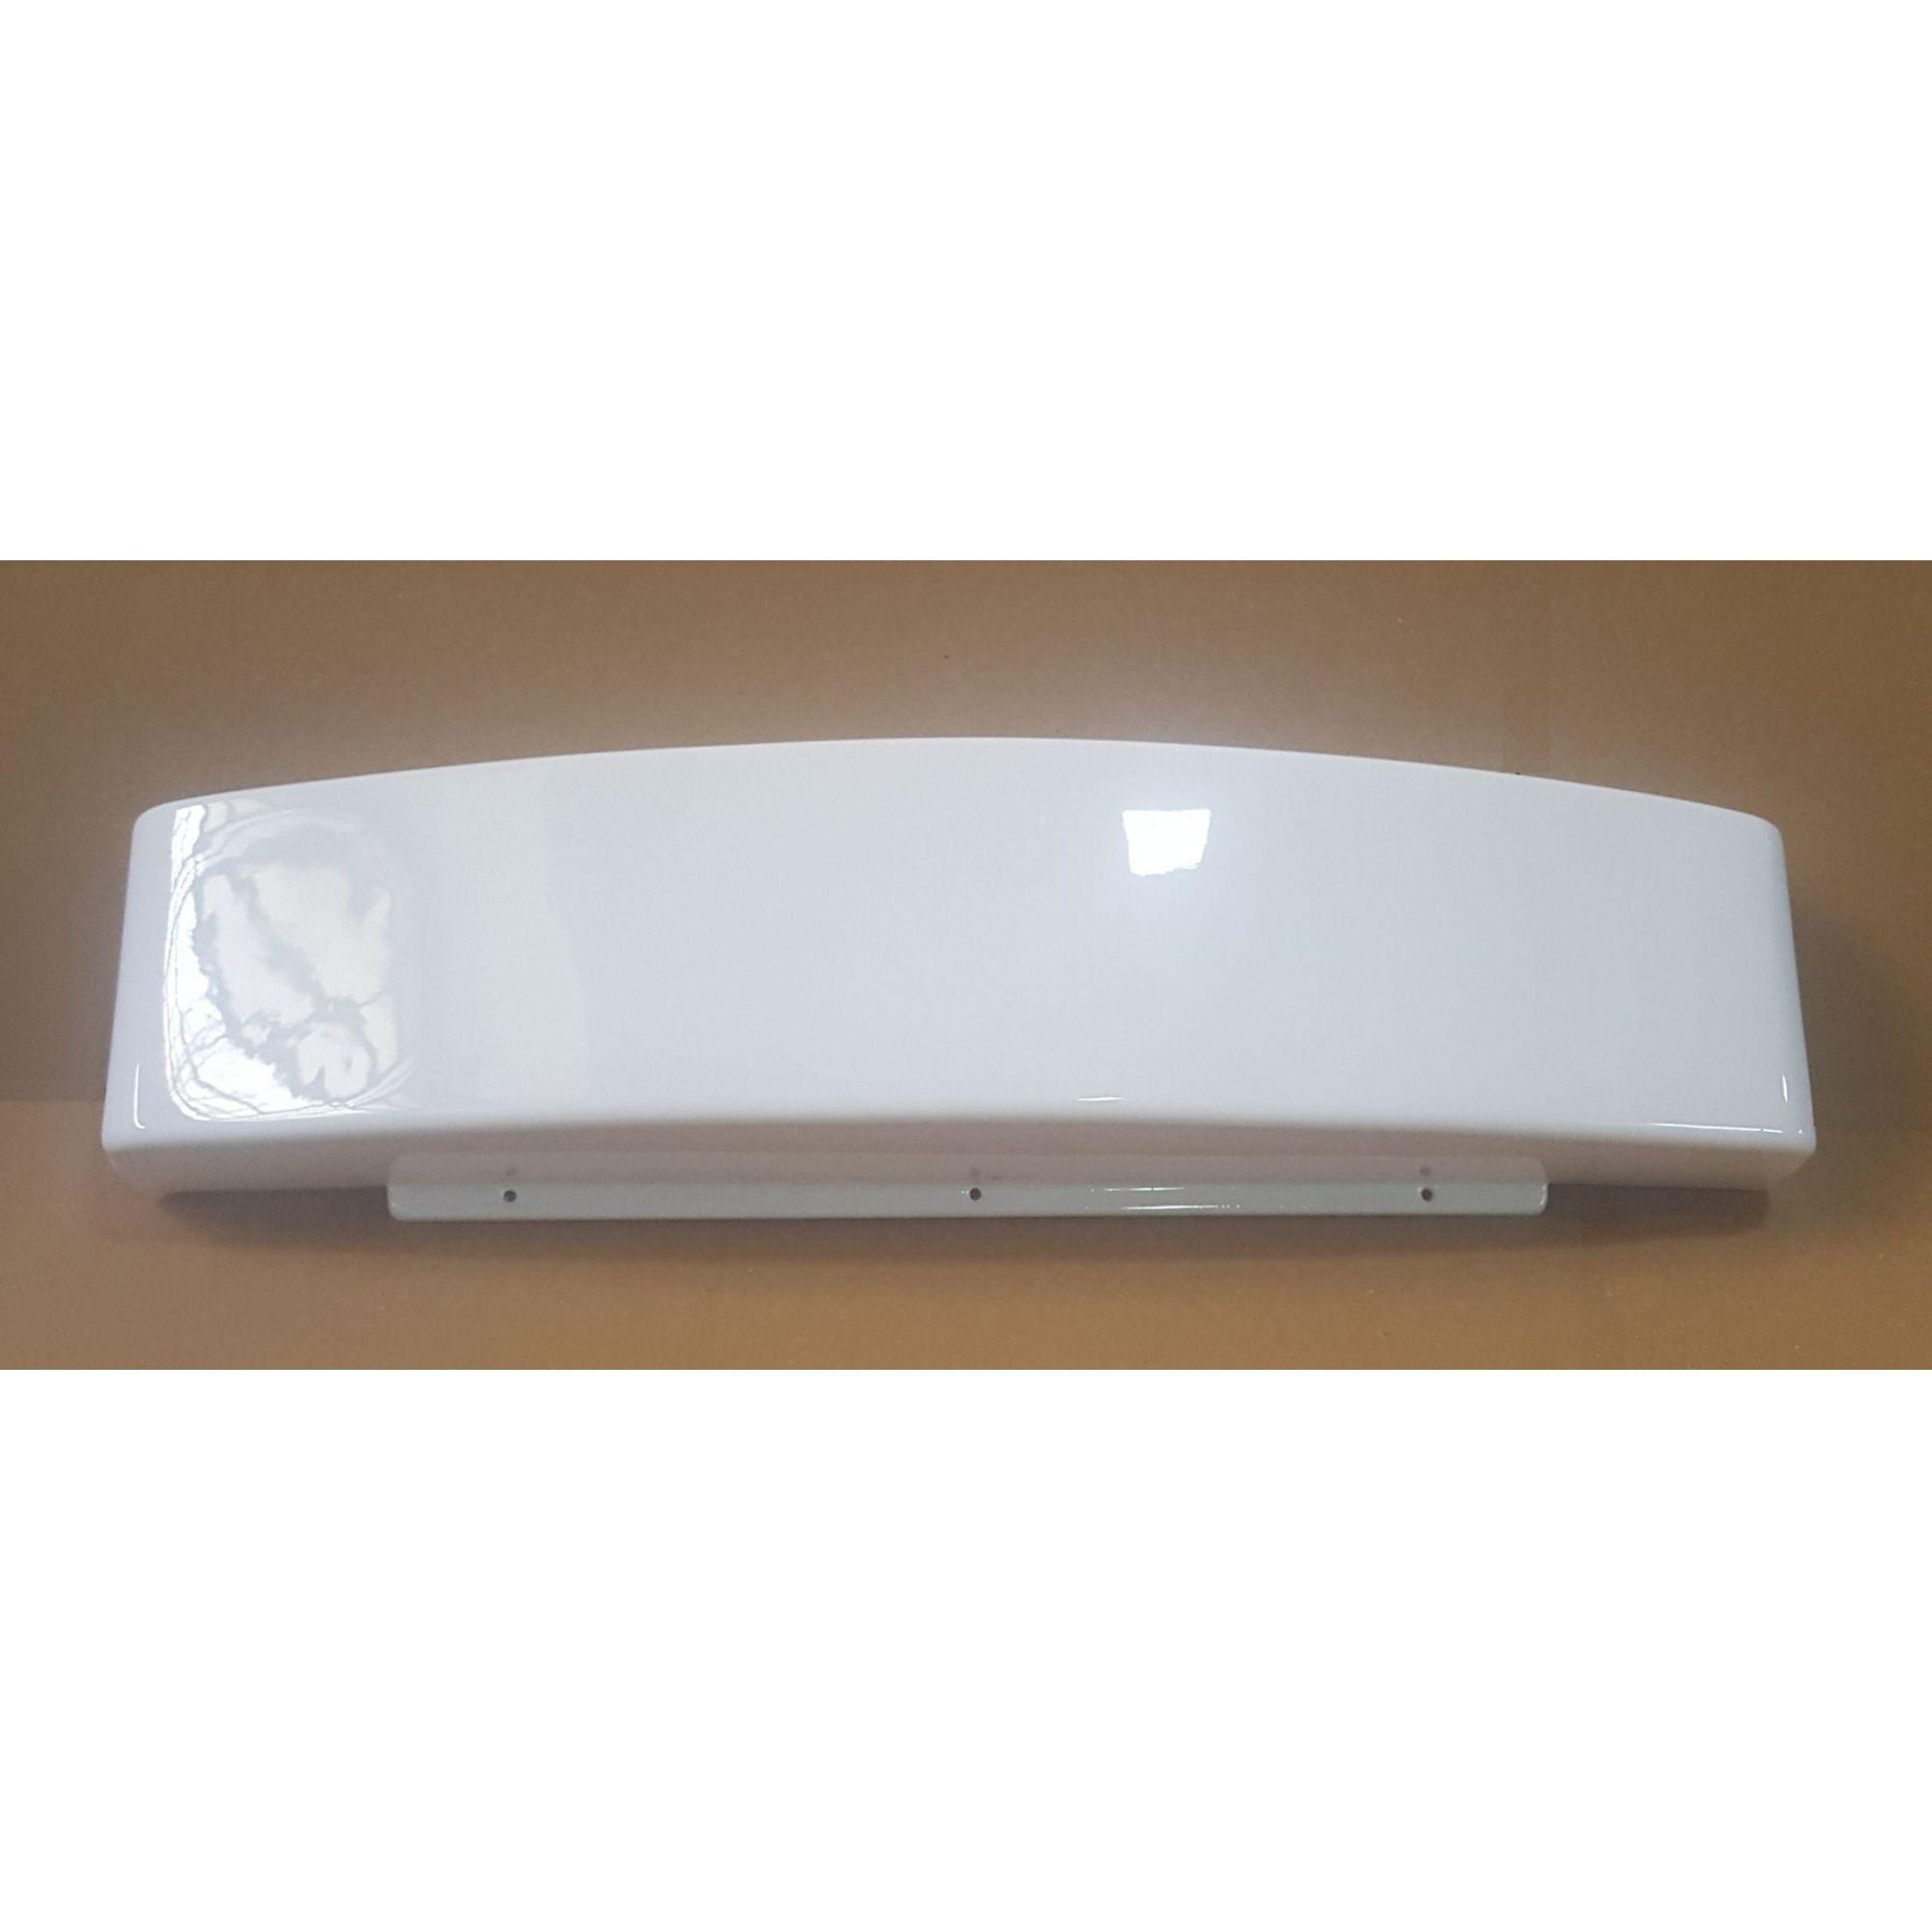 Testeira Para Freezer Gelopar Branca Medida 15 x 68 cm